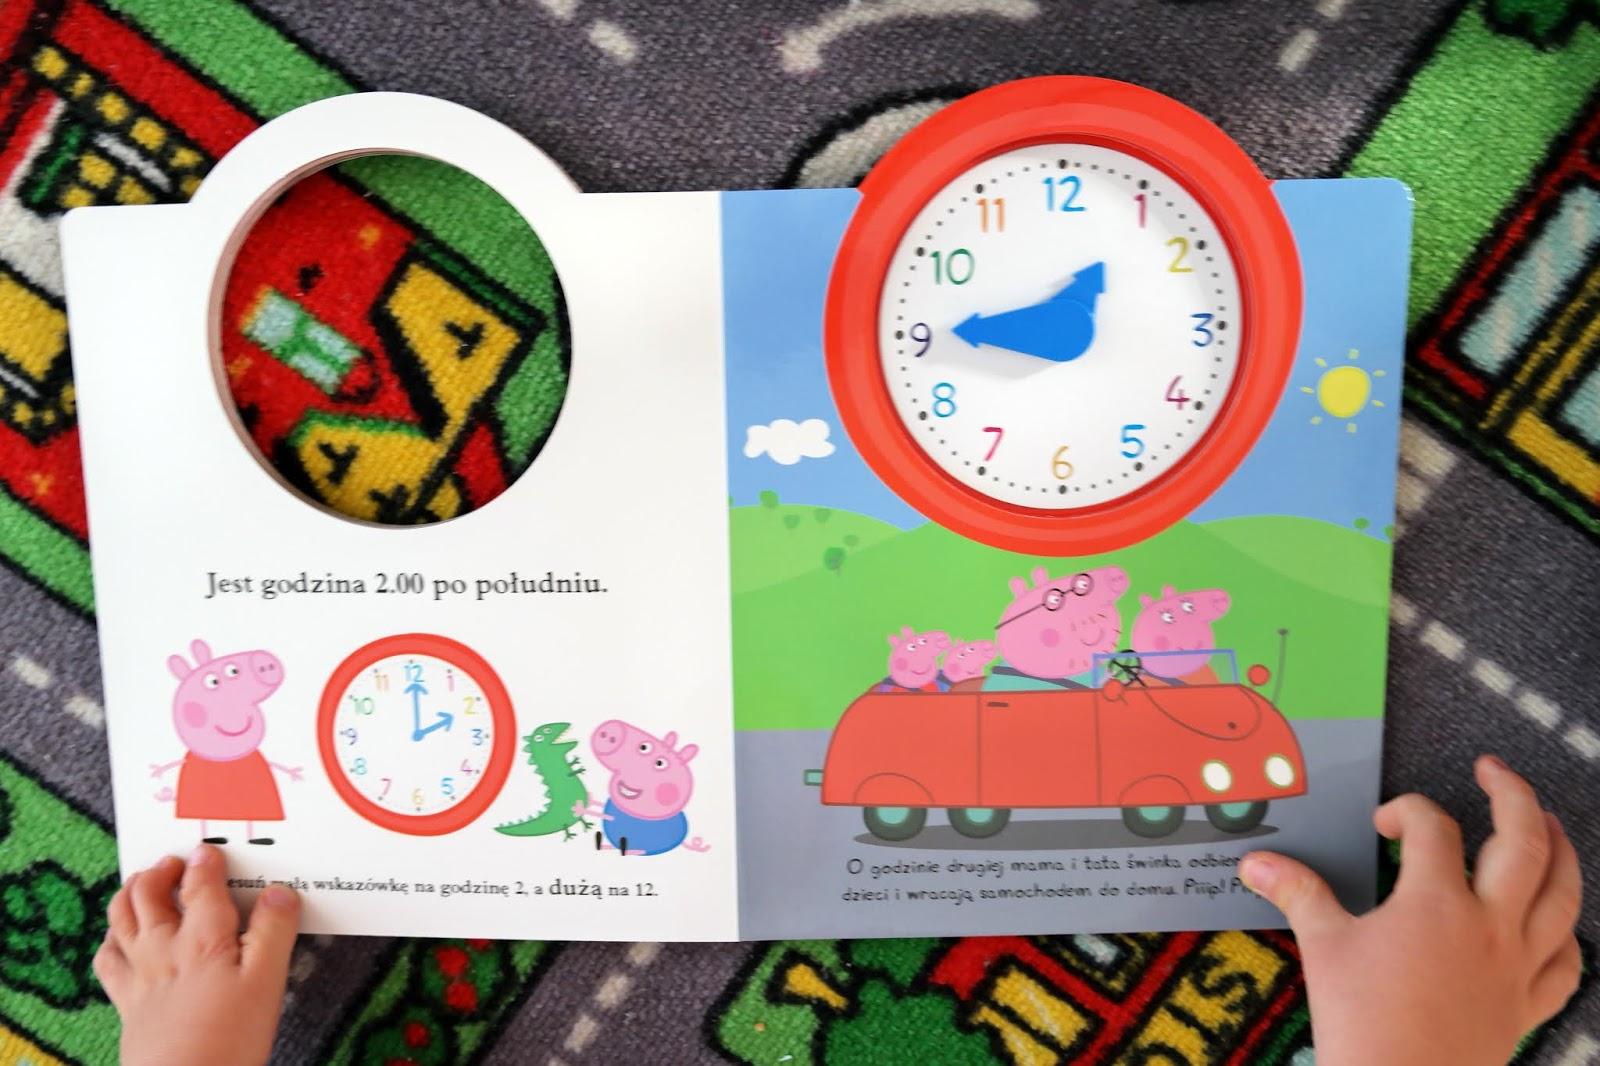 zegar świnki peppy